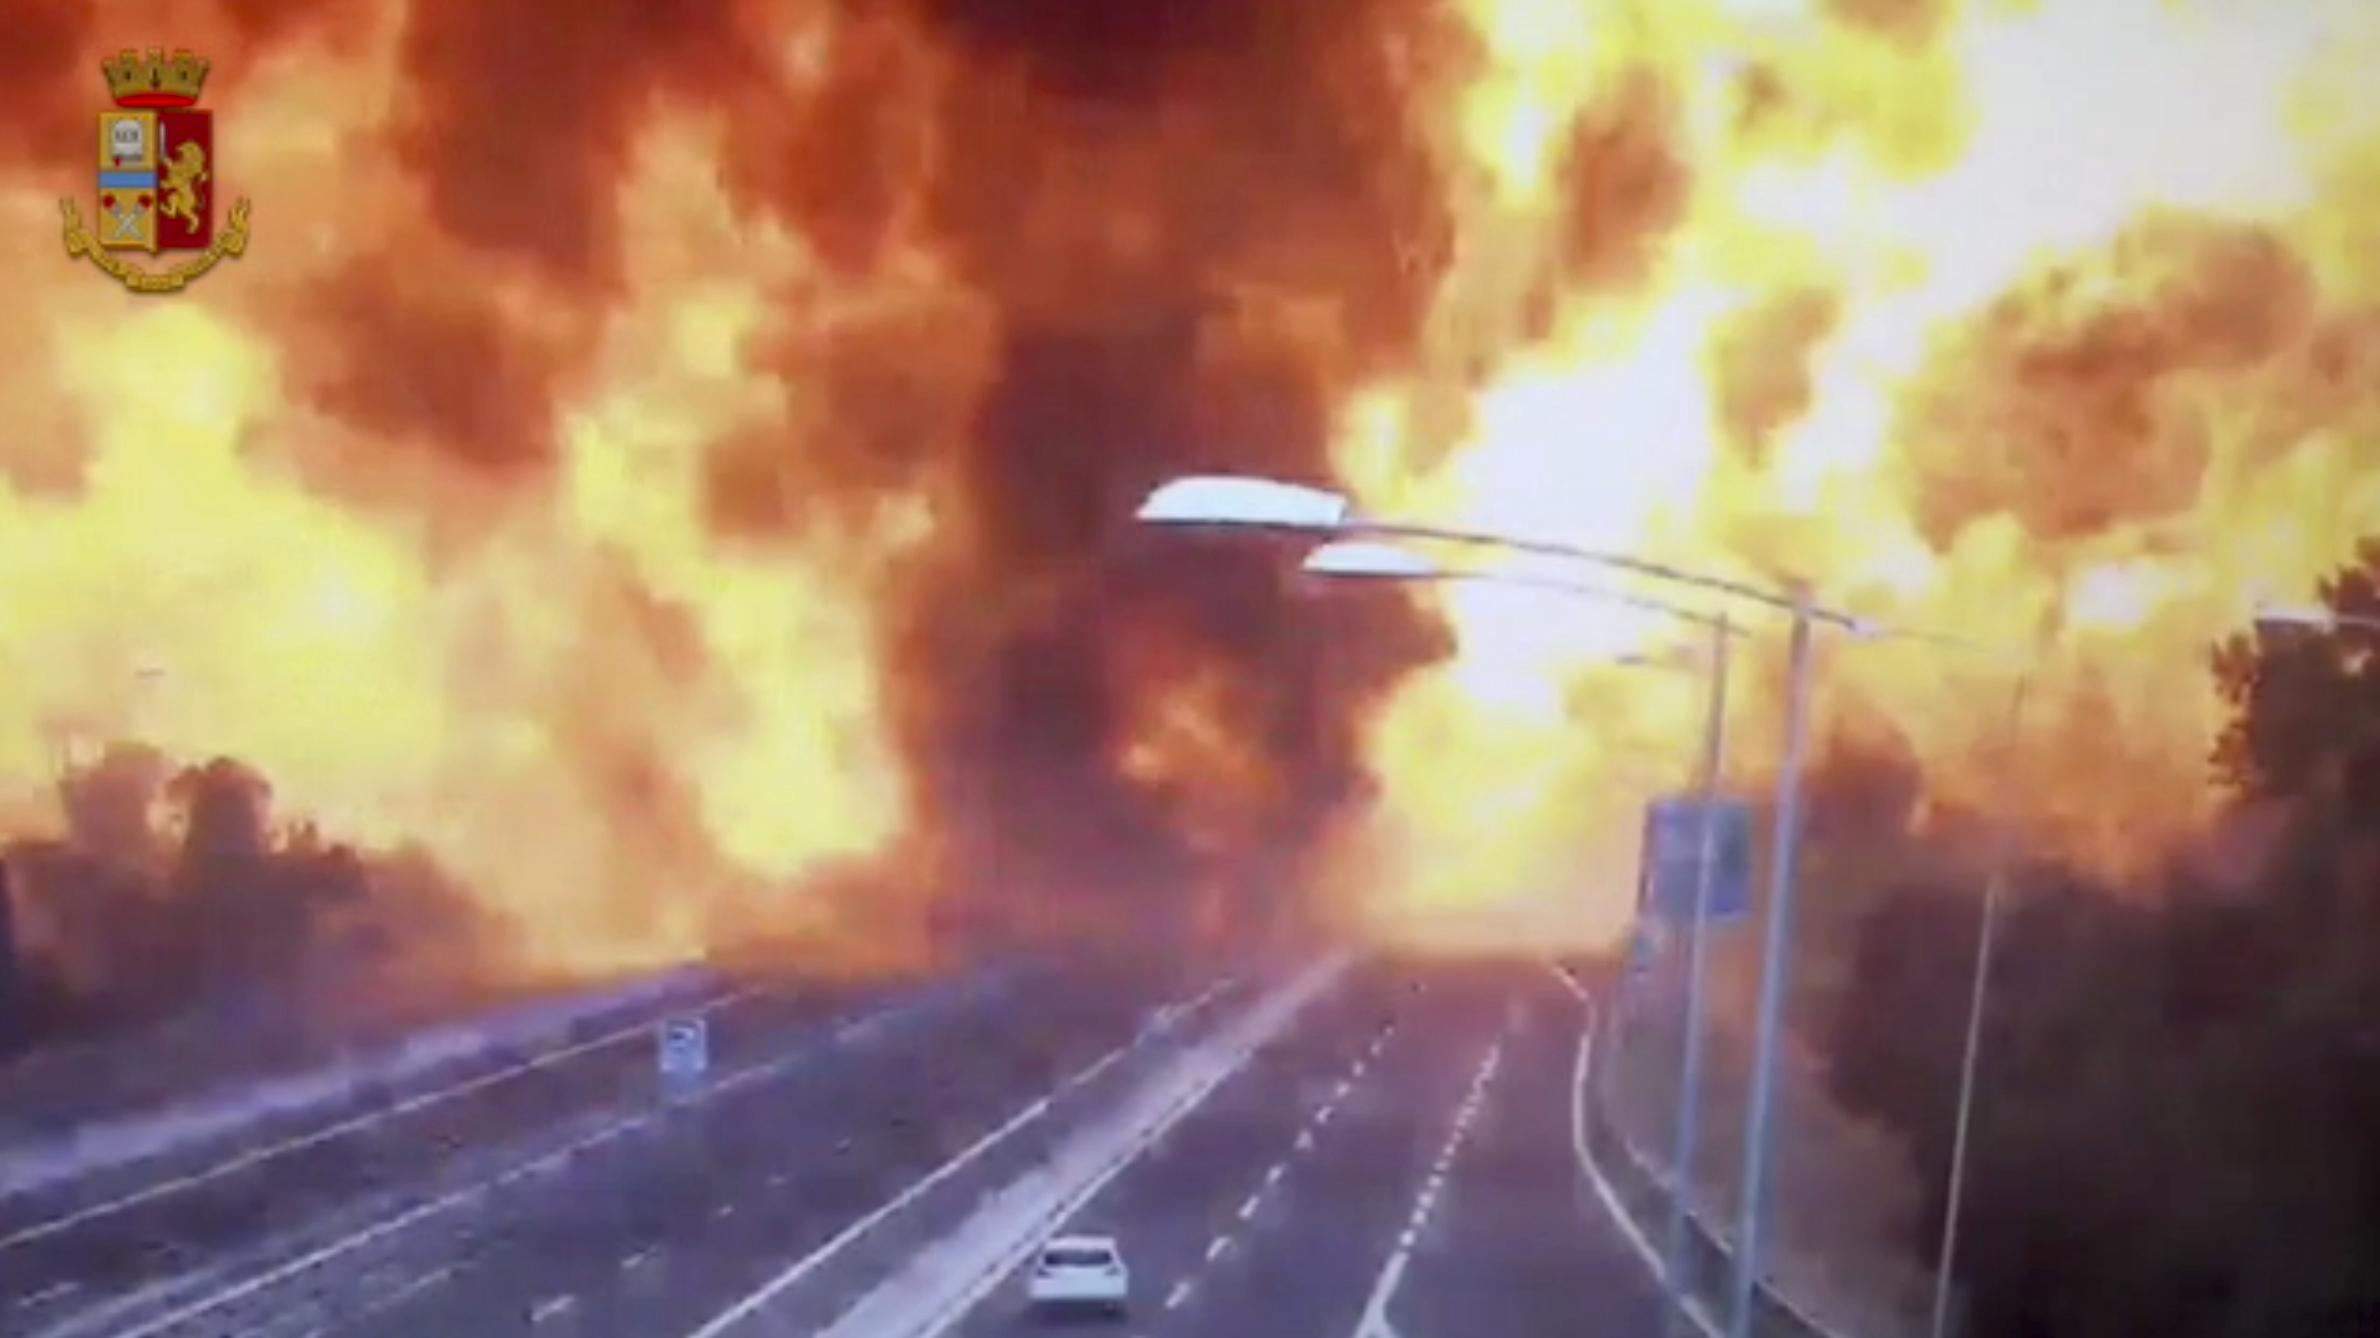 Italy_Highway_Explosion_14887-159532.jpg57860512